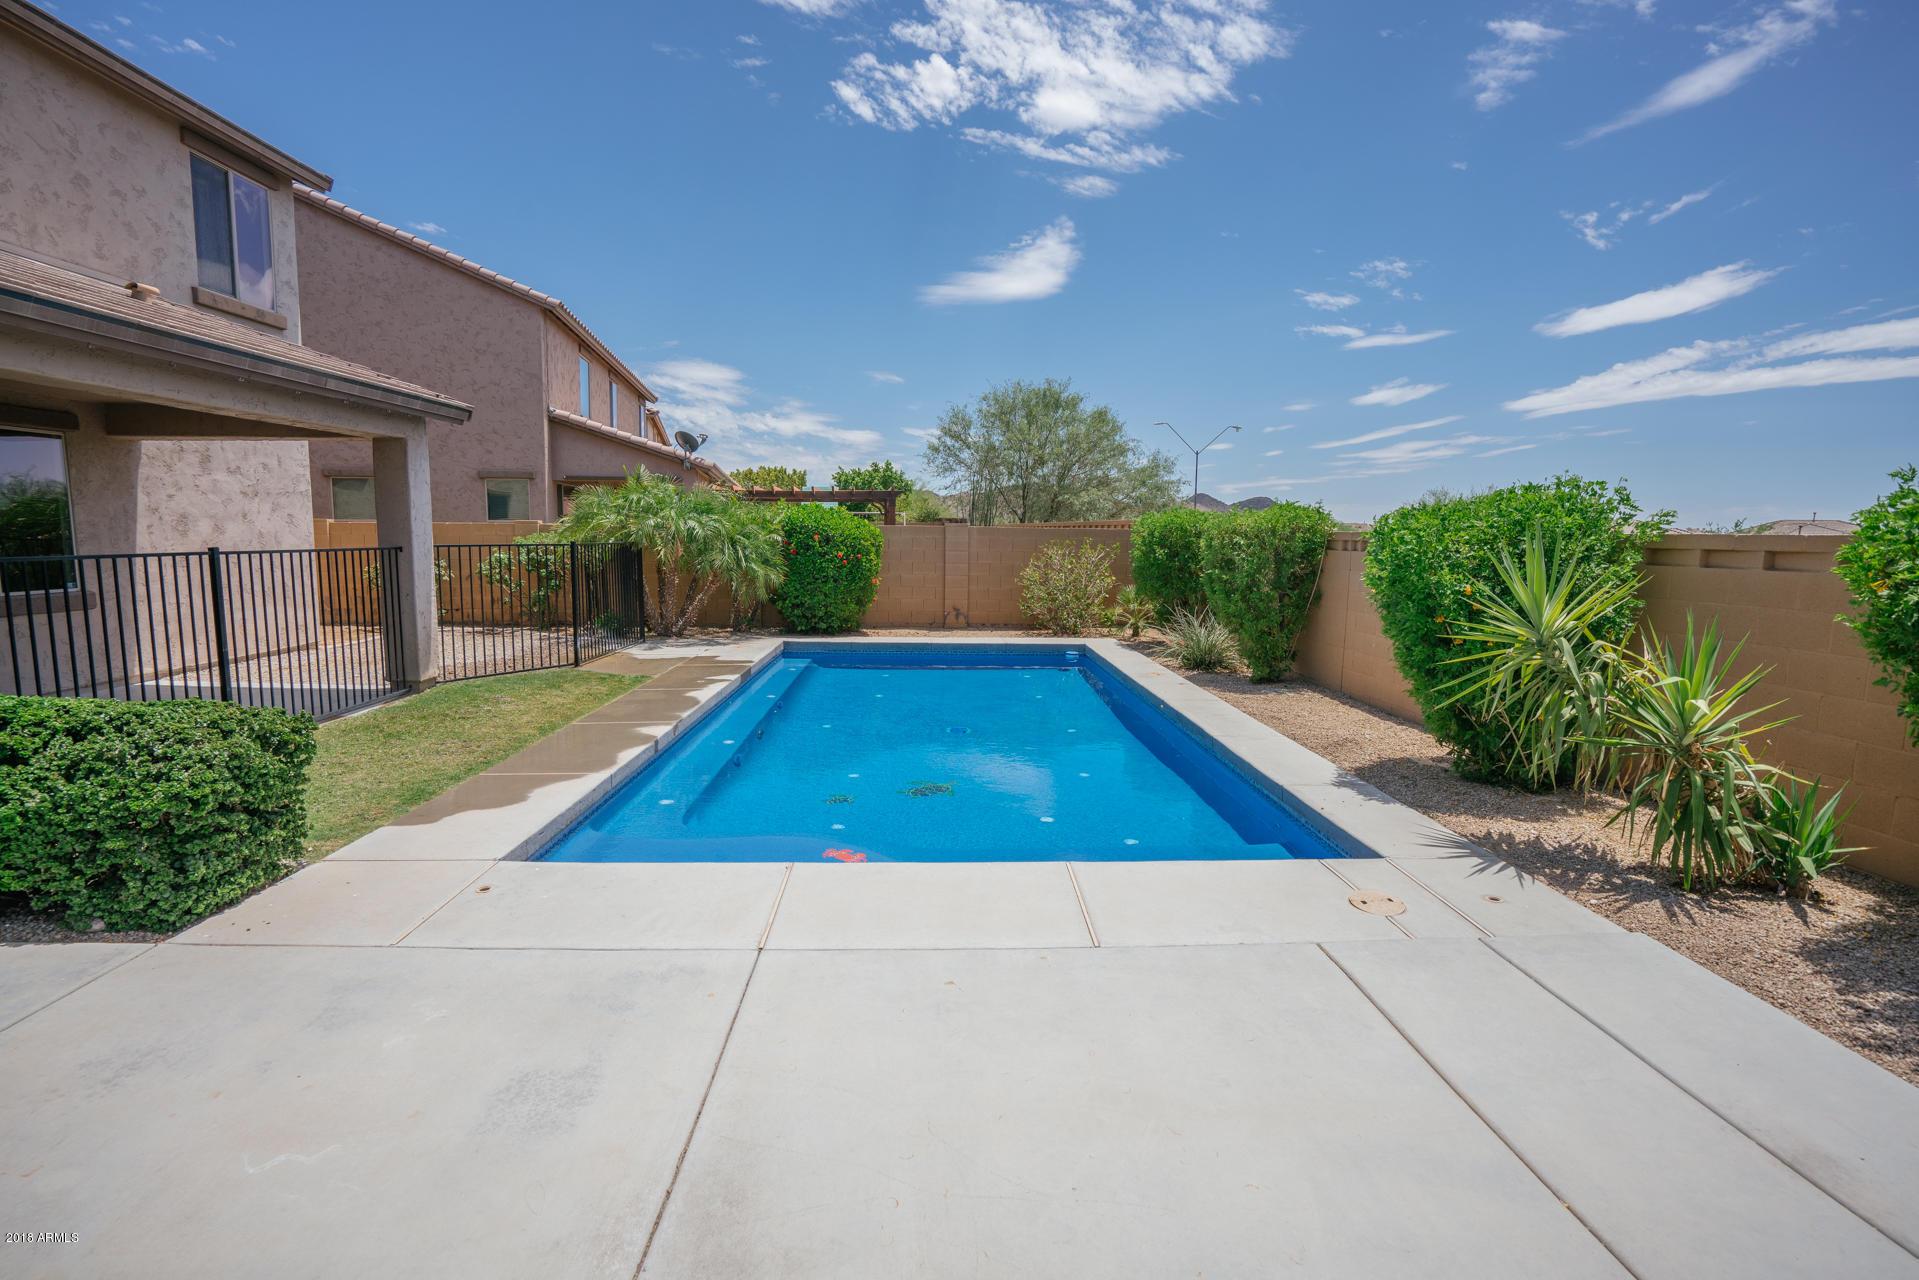 MLS 5790010 27842 N SIERRA SKY Drive, Peoria, AZ 85383 Peoria AZ Westwing Mountain